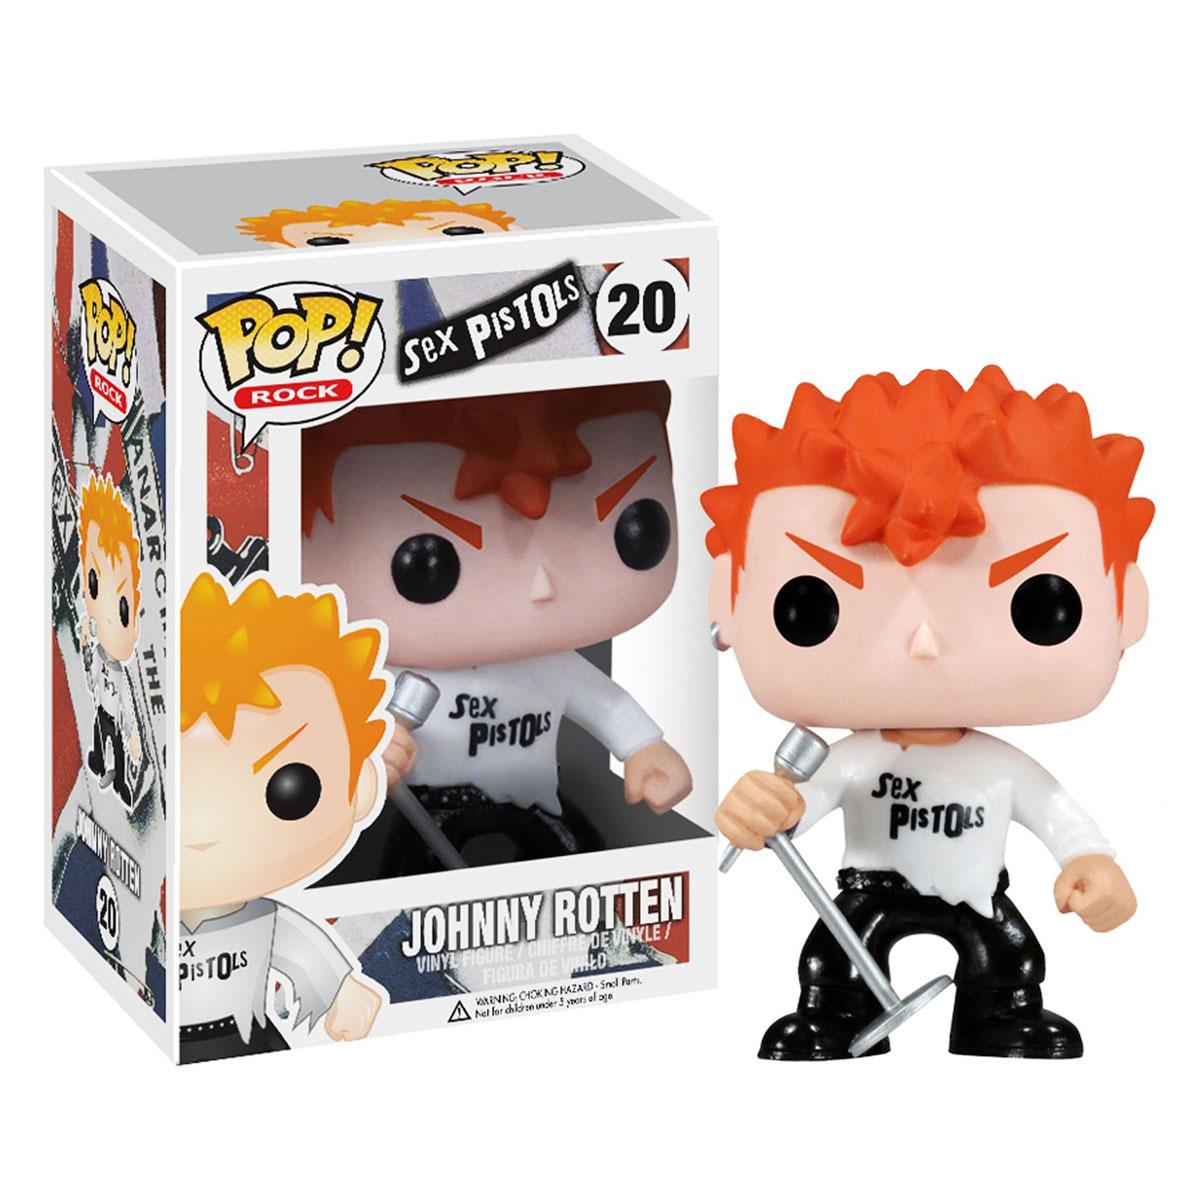 Boneco Funko Pop Rocks Sex Pistols Johnny Rotten